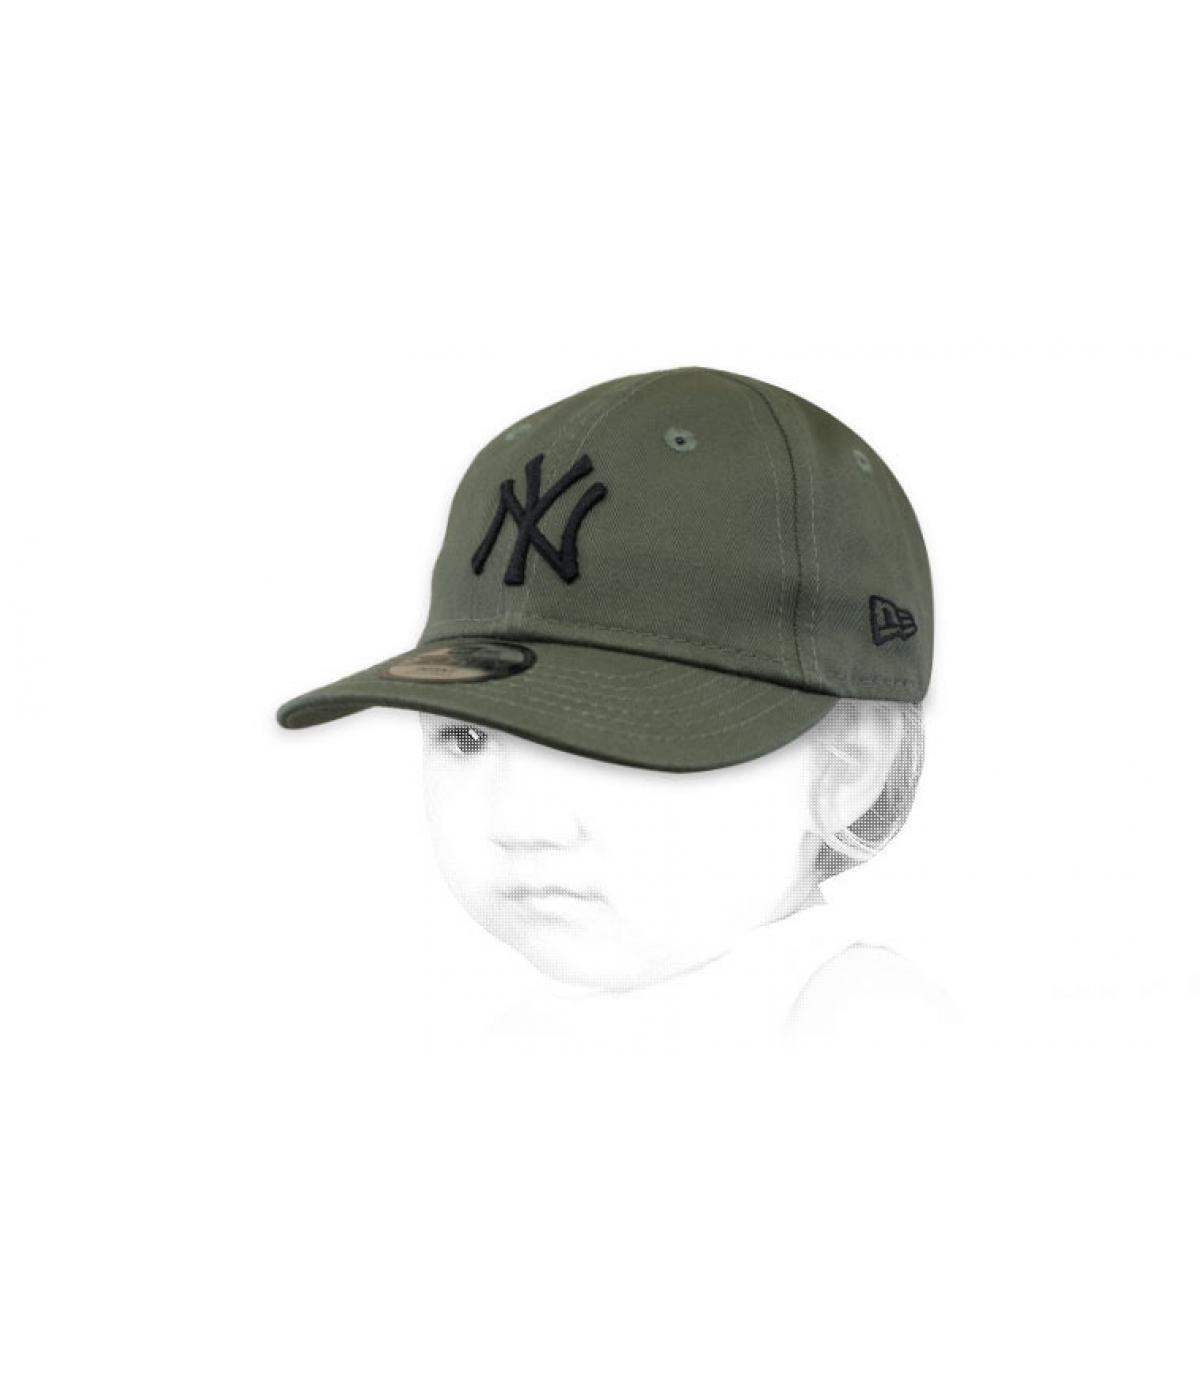 Cappellino verde NY